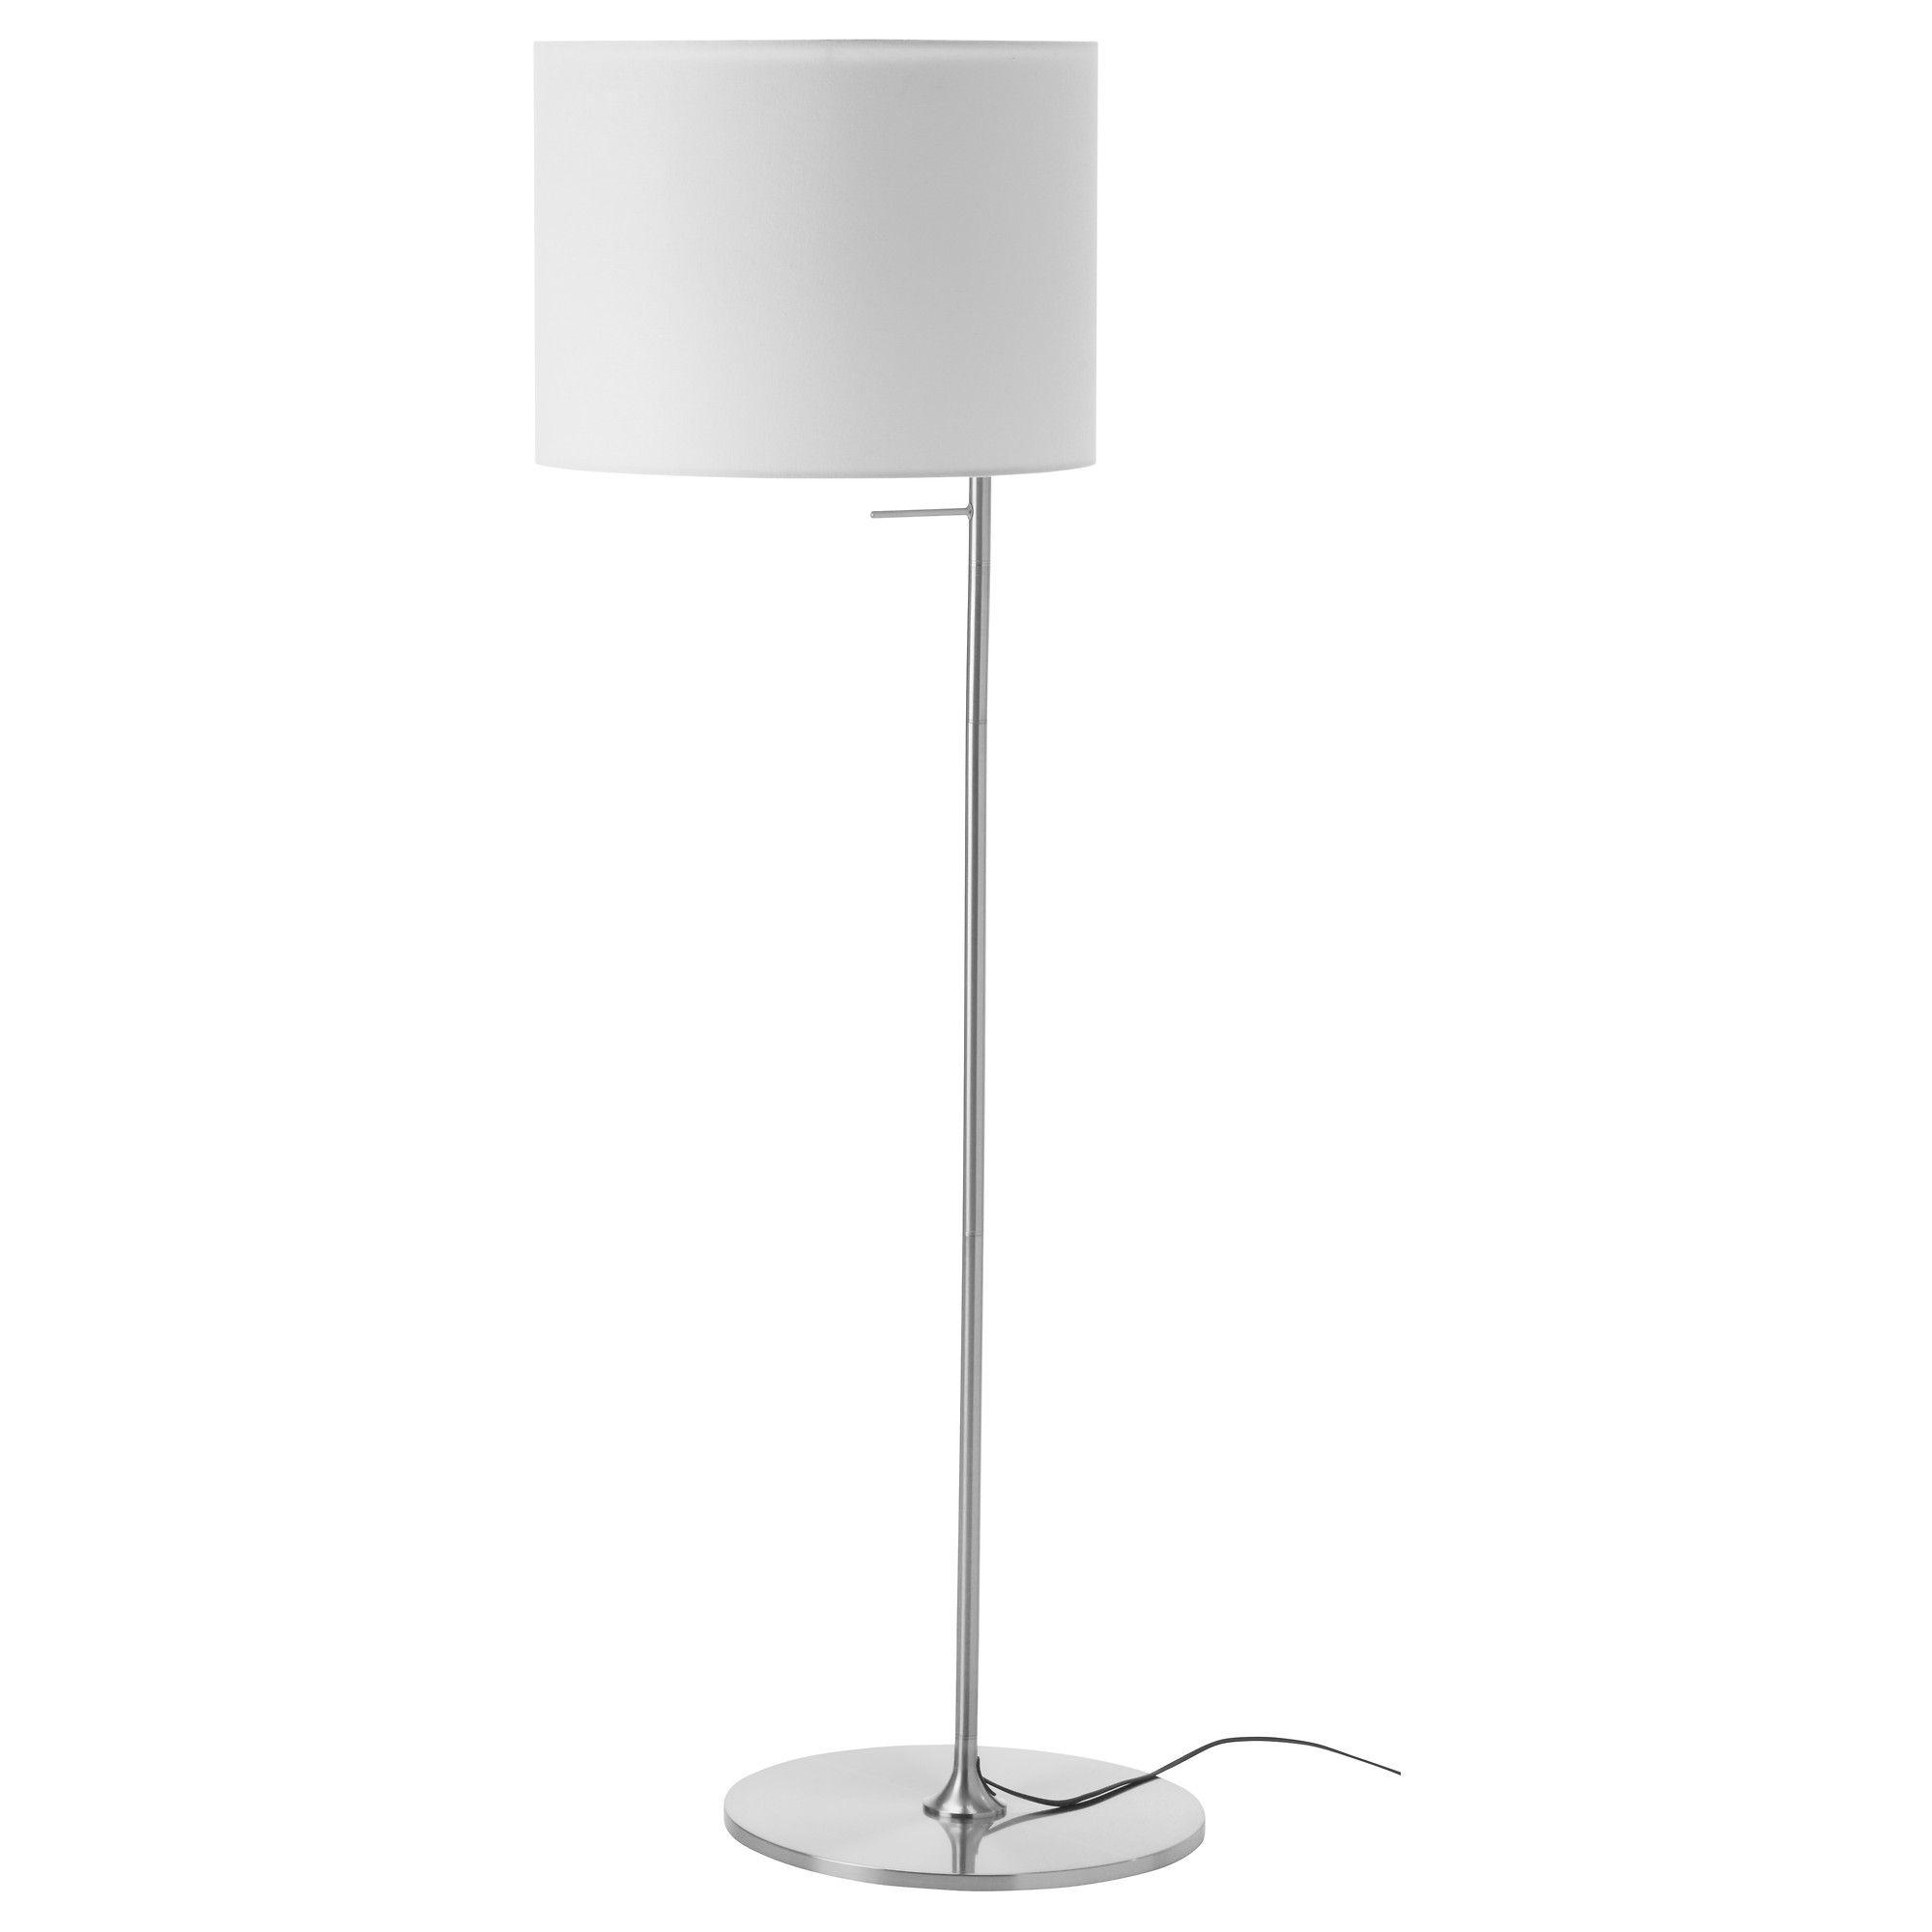 STOCKHOLM Gulvlampe - IKEA